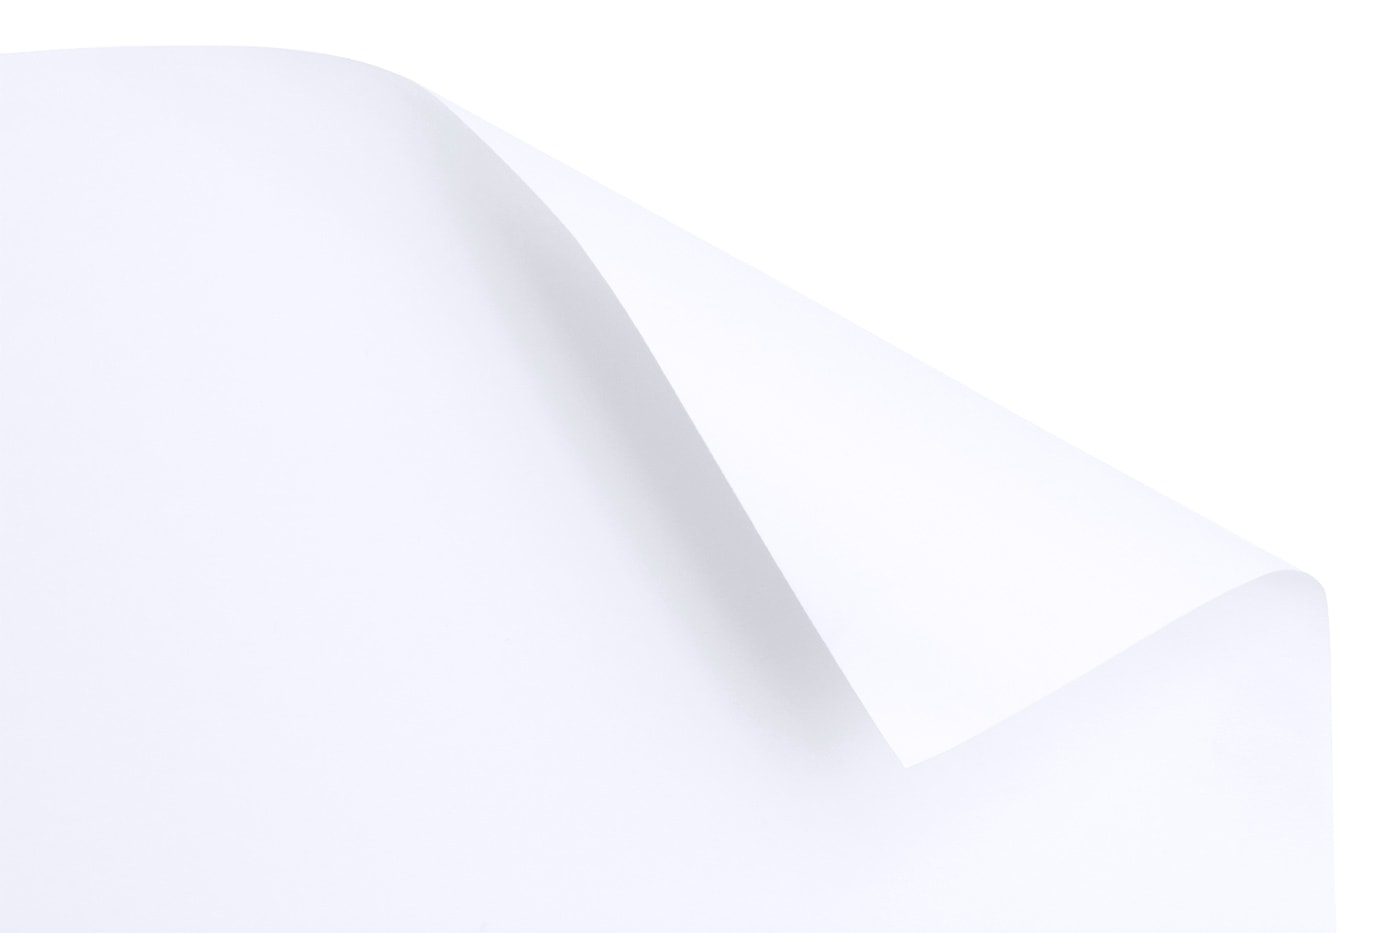 Micro-Modellkarton, weiß, ca. 0,3 mm, 70 x 100 cm VE 10 Bogen